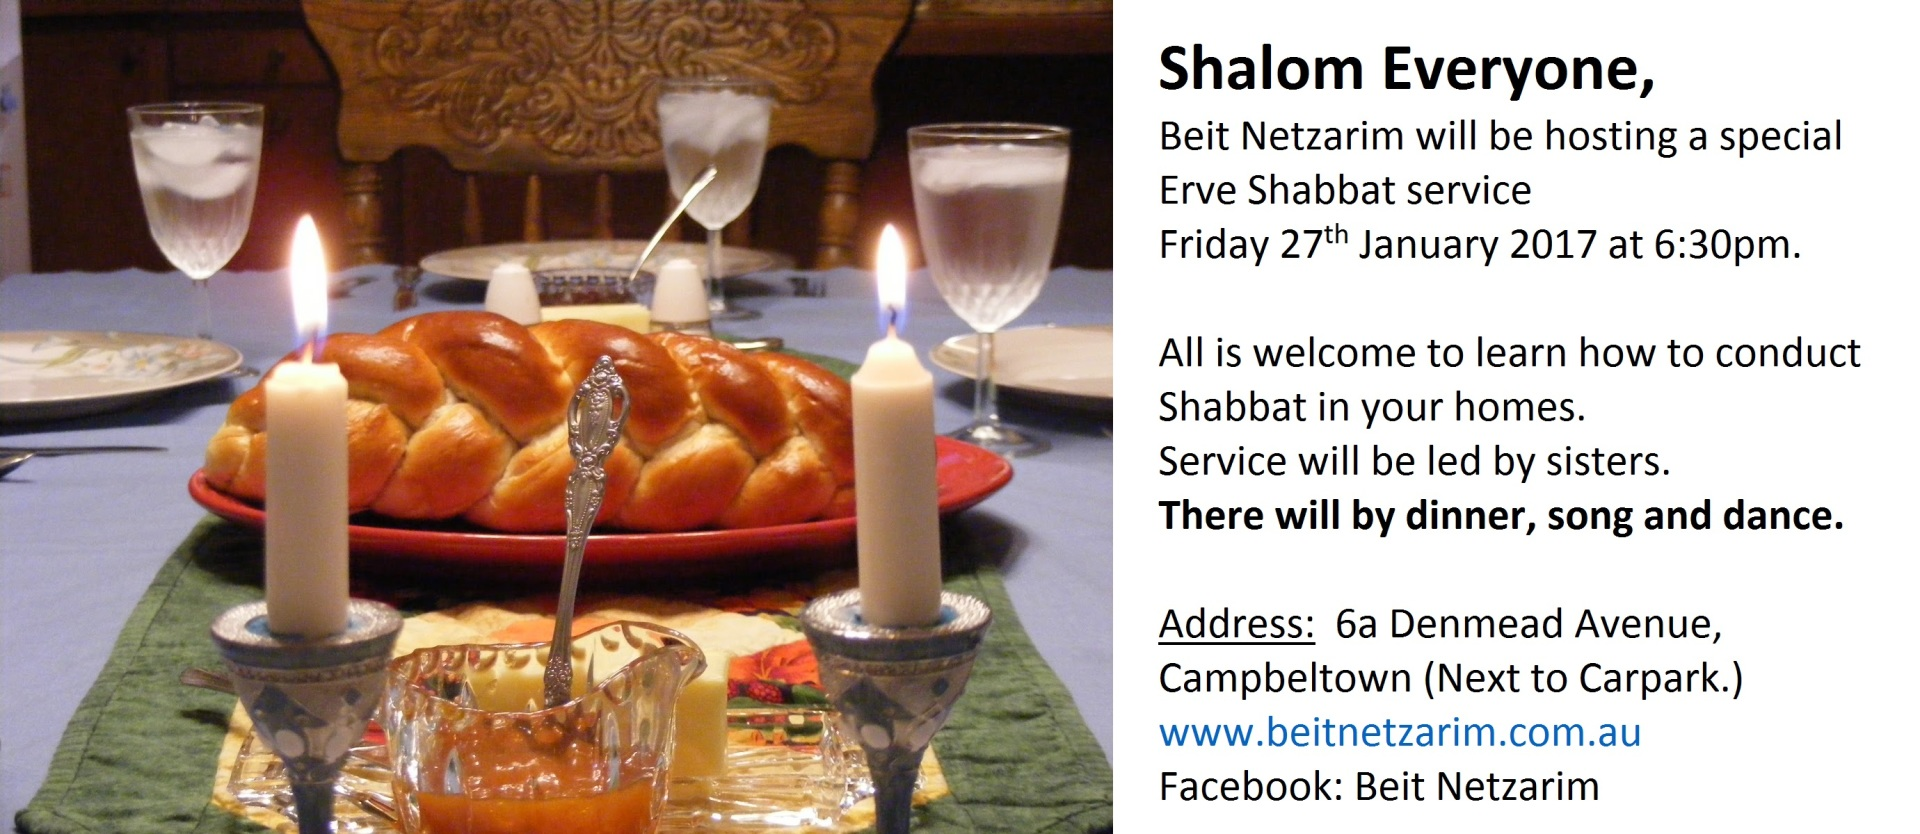 Erve Shabbat service